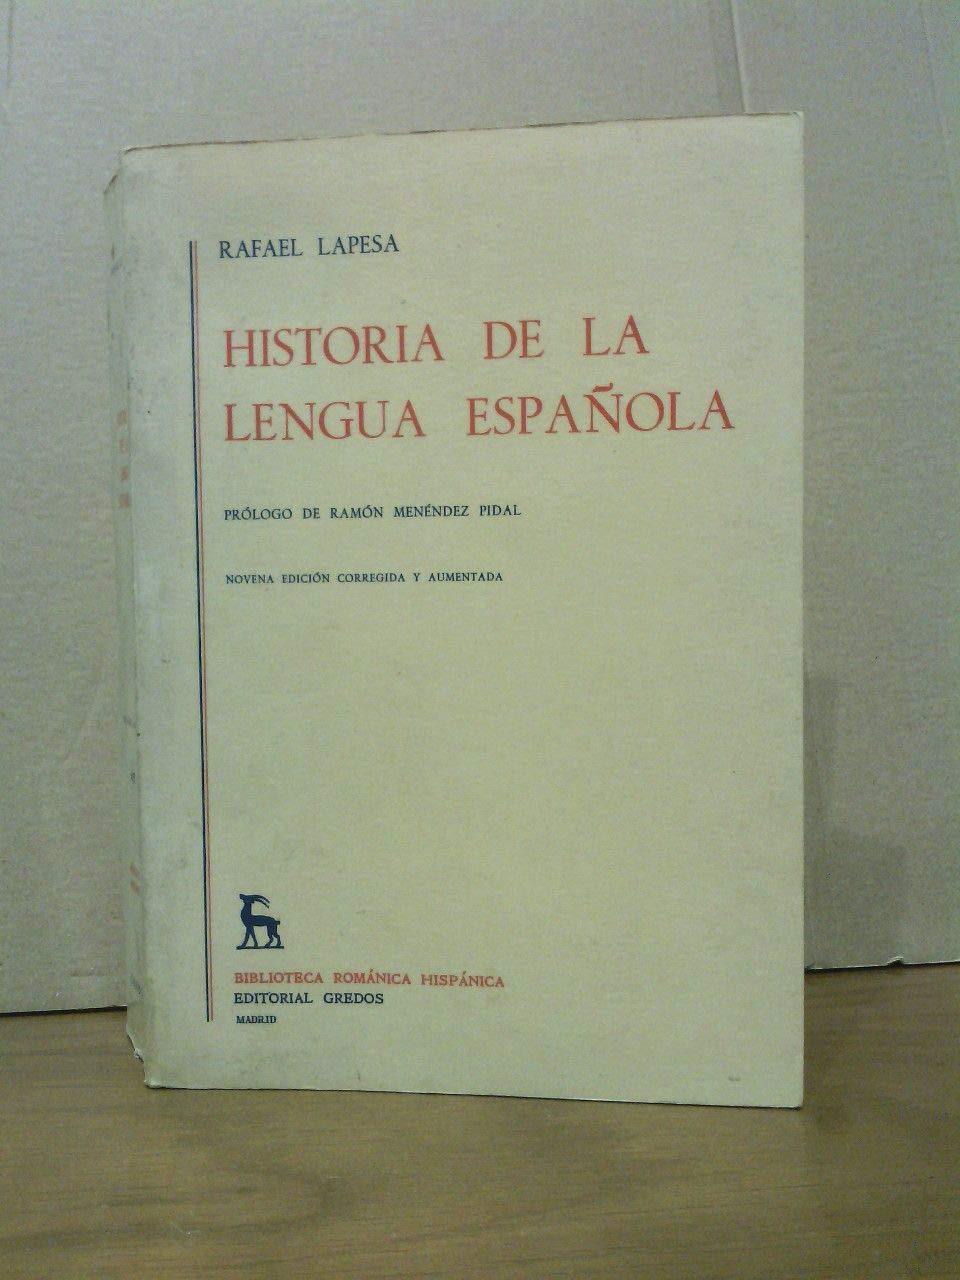 Historia de la lengua española / Prólogo de Ramón Menéndez Pidal: Amazon.es: LAPESA, Rafael: Libros